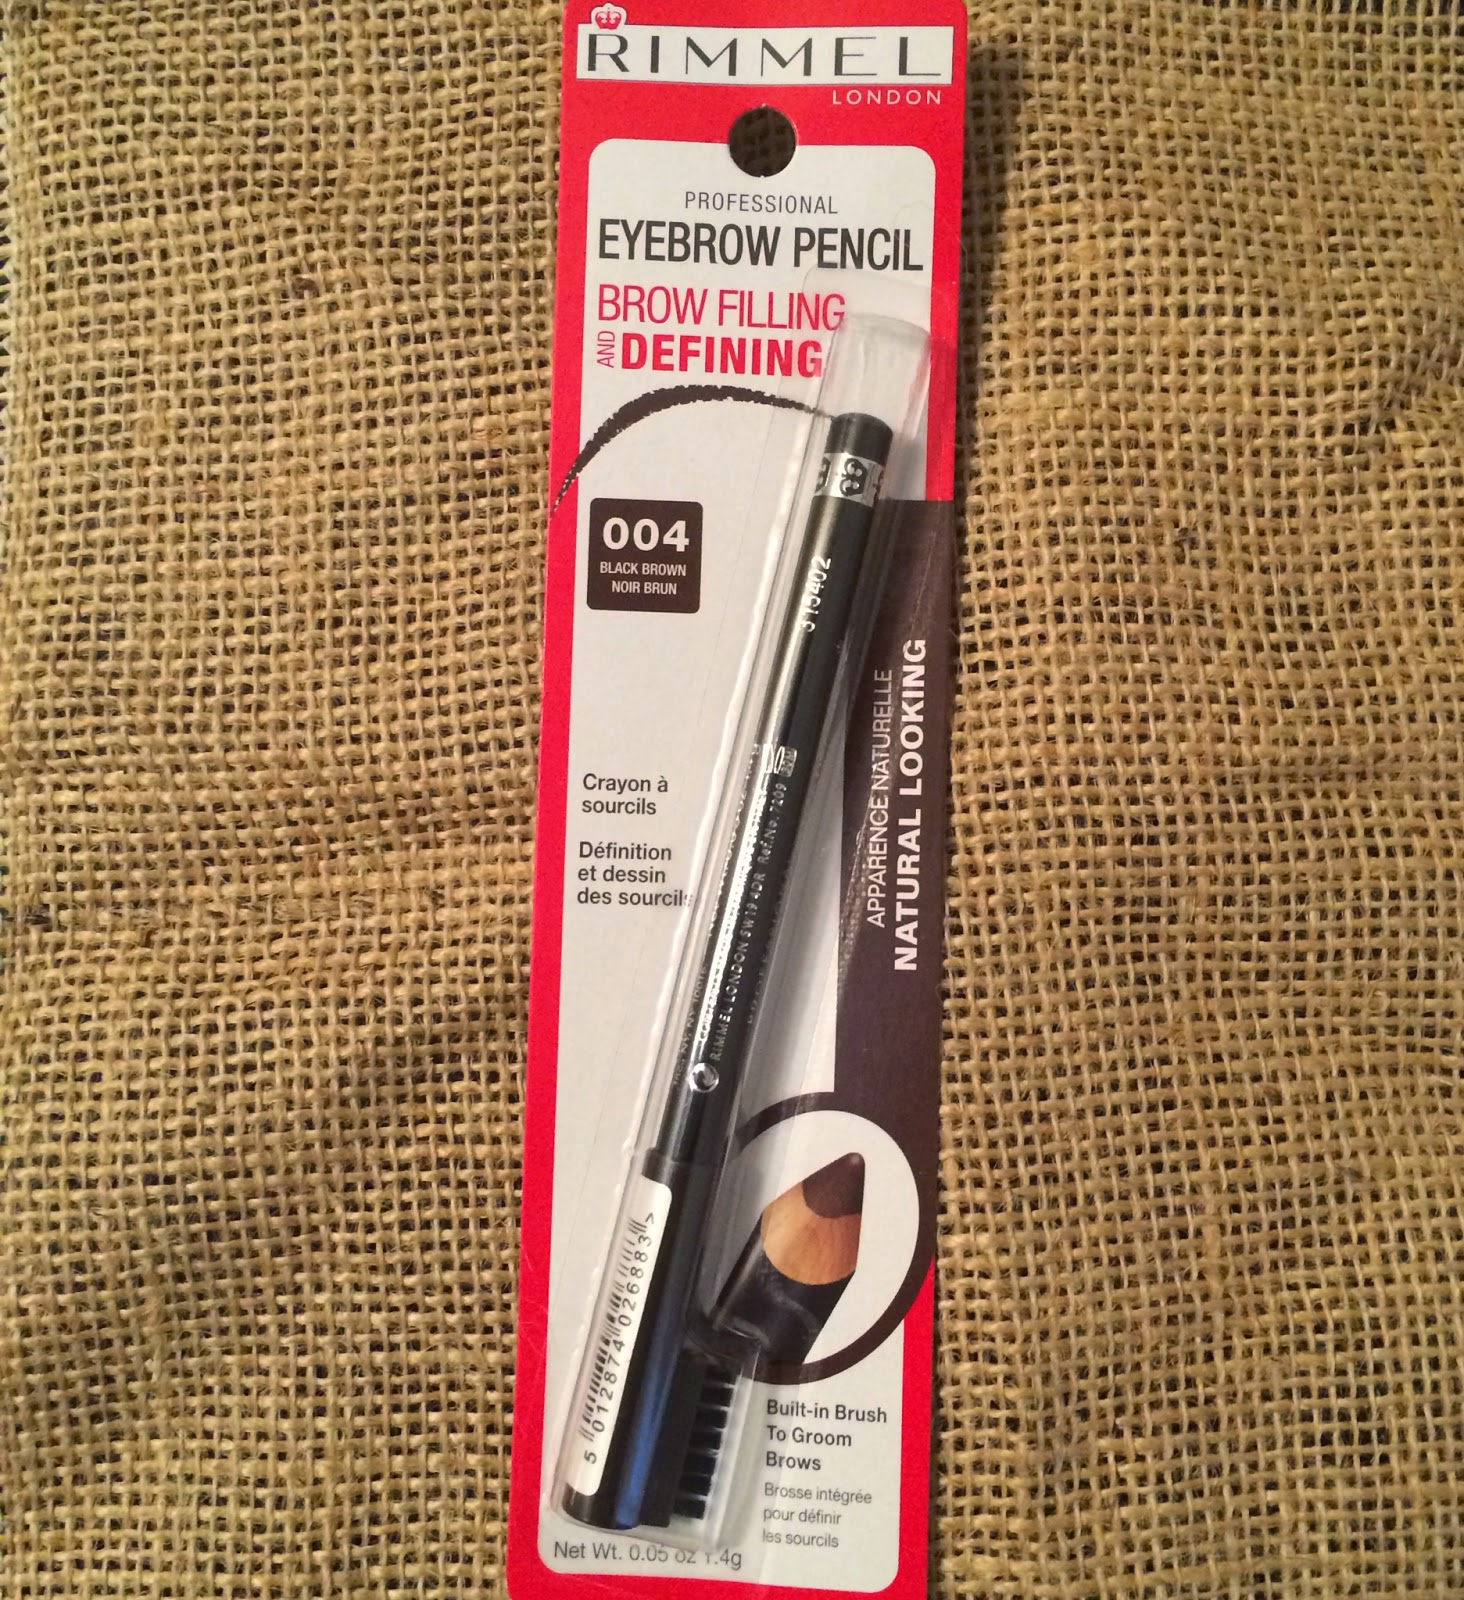 Rimmel London Professional Eyebrow Pencil Its Arkeedah Source